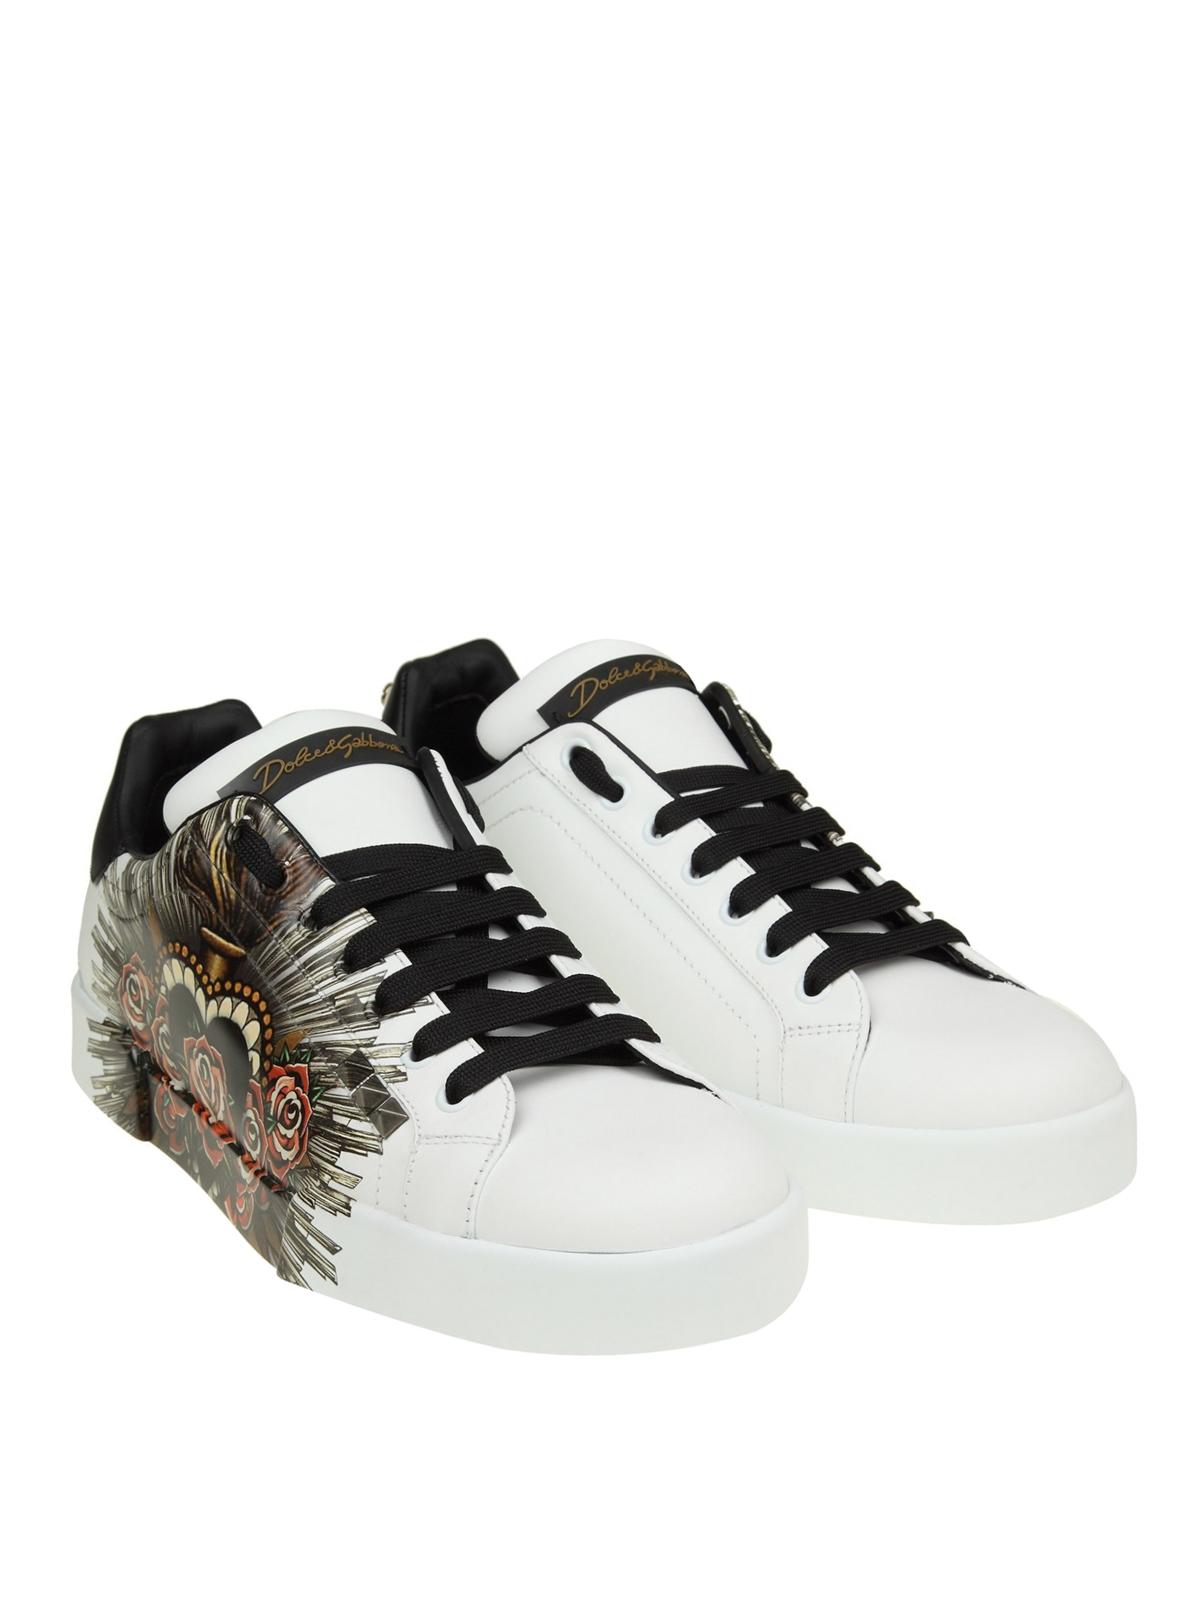 ecf54375ef5f DOLCE   GABBANA  trainers online - Portofino printed leather sneakers